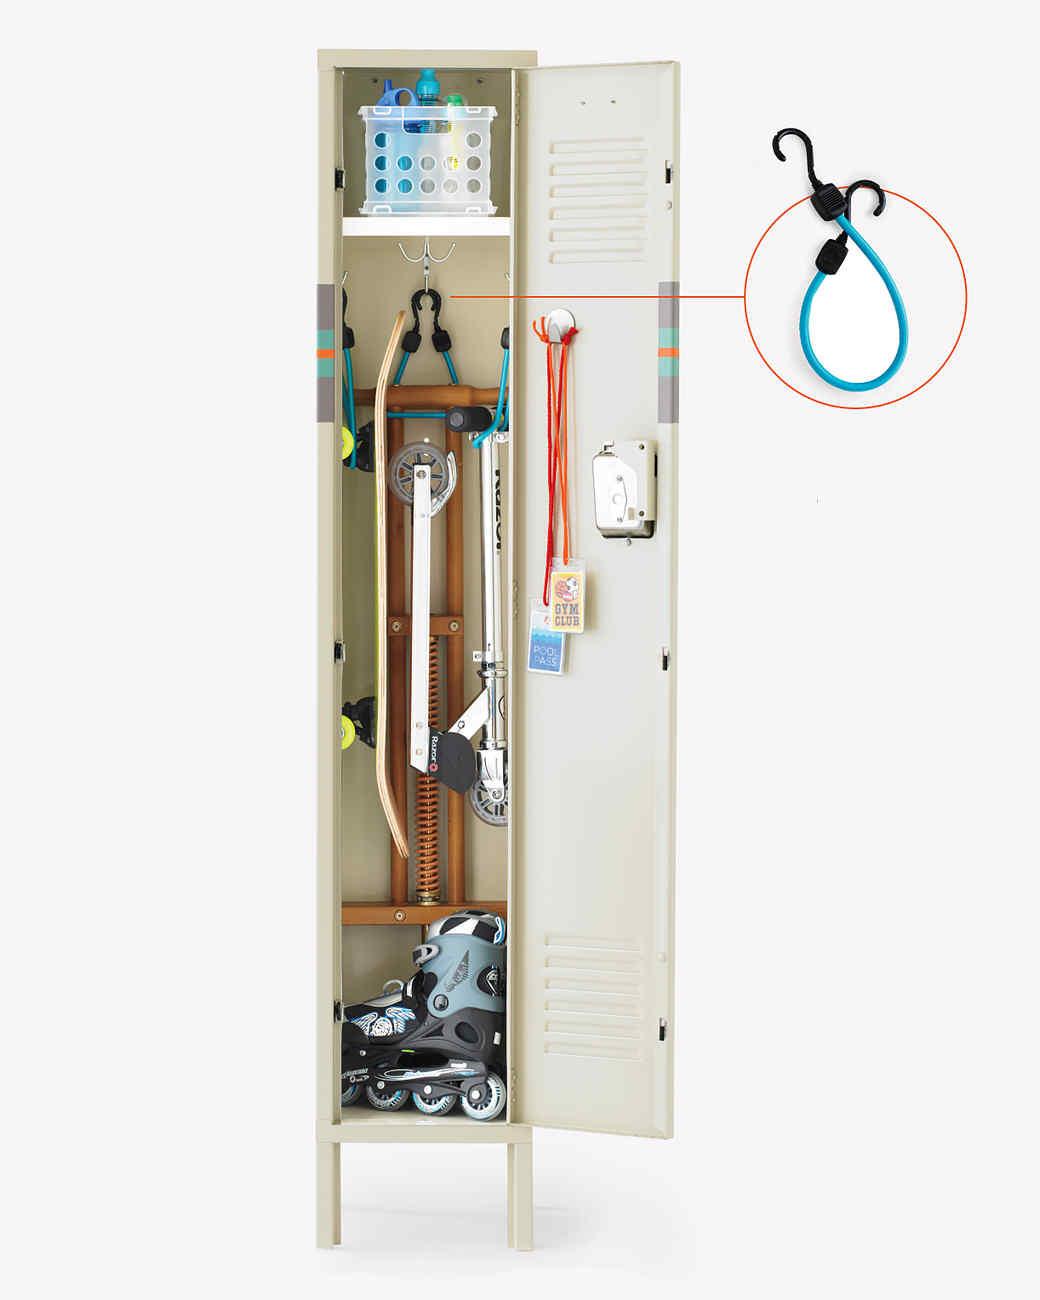 organizer-locker-cord-0911mld107625.jpg